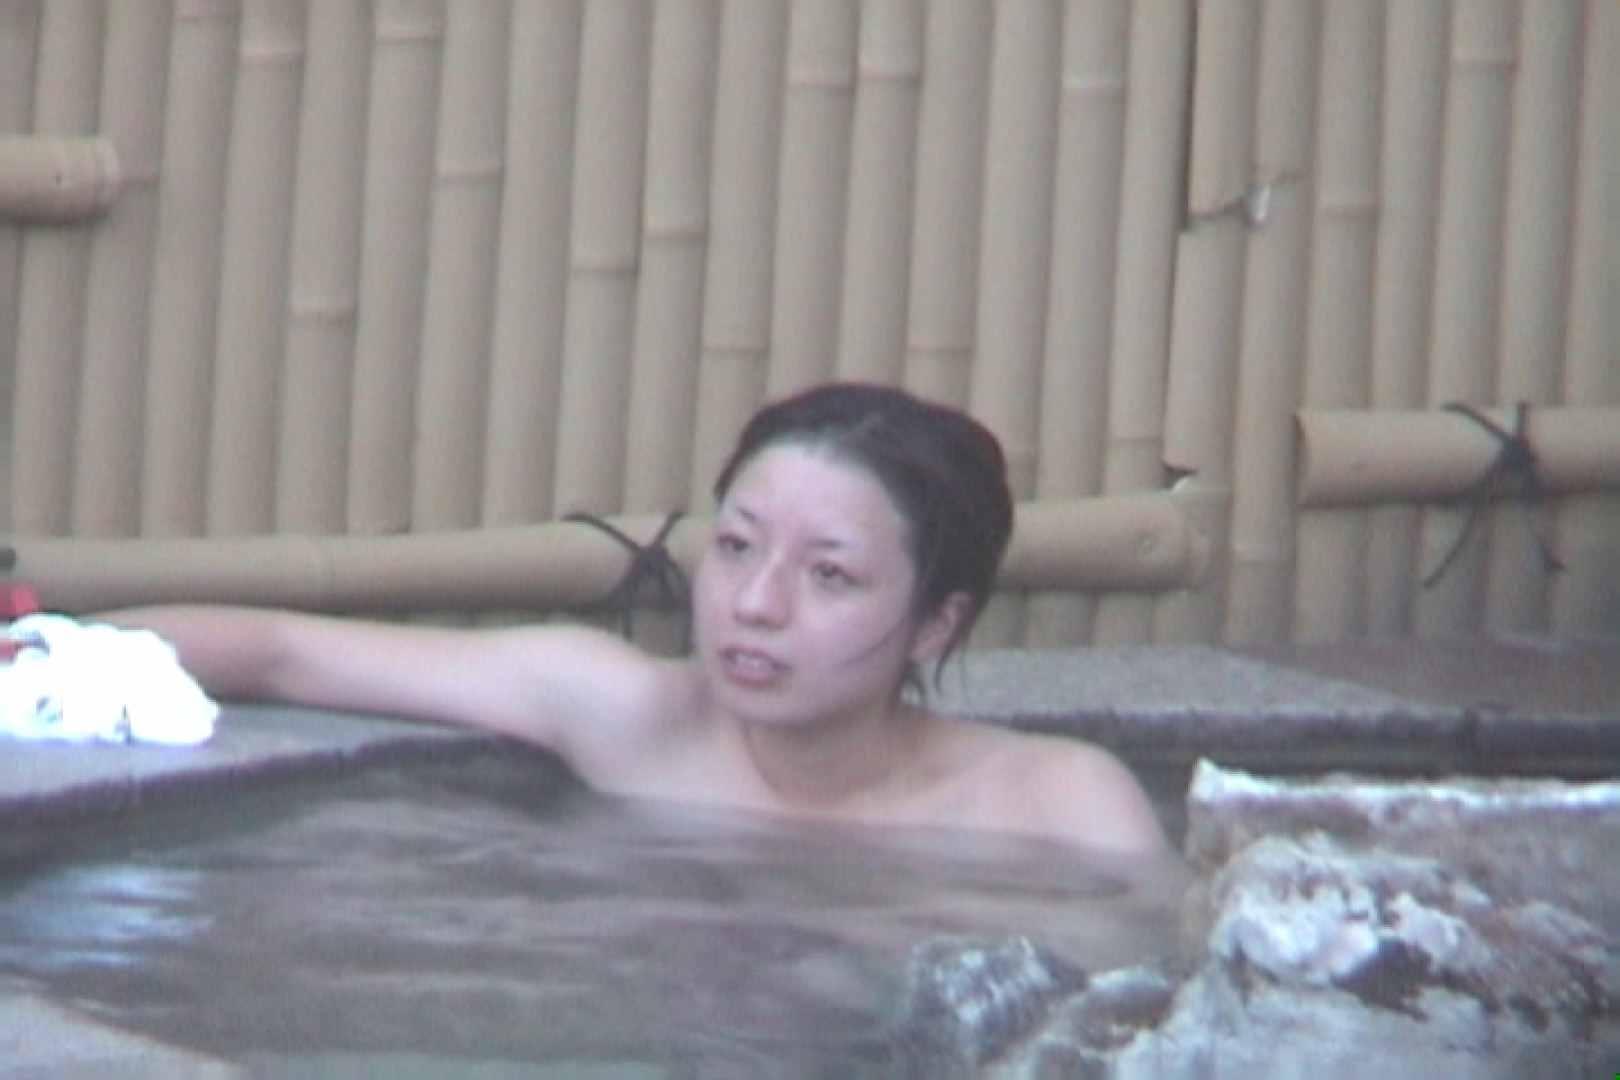 Aquaな露天風呂Vol.608 露天風呂突入 | 盗撮師作品  95pic 49